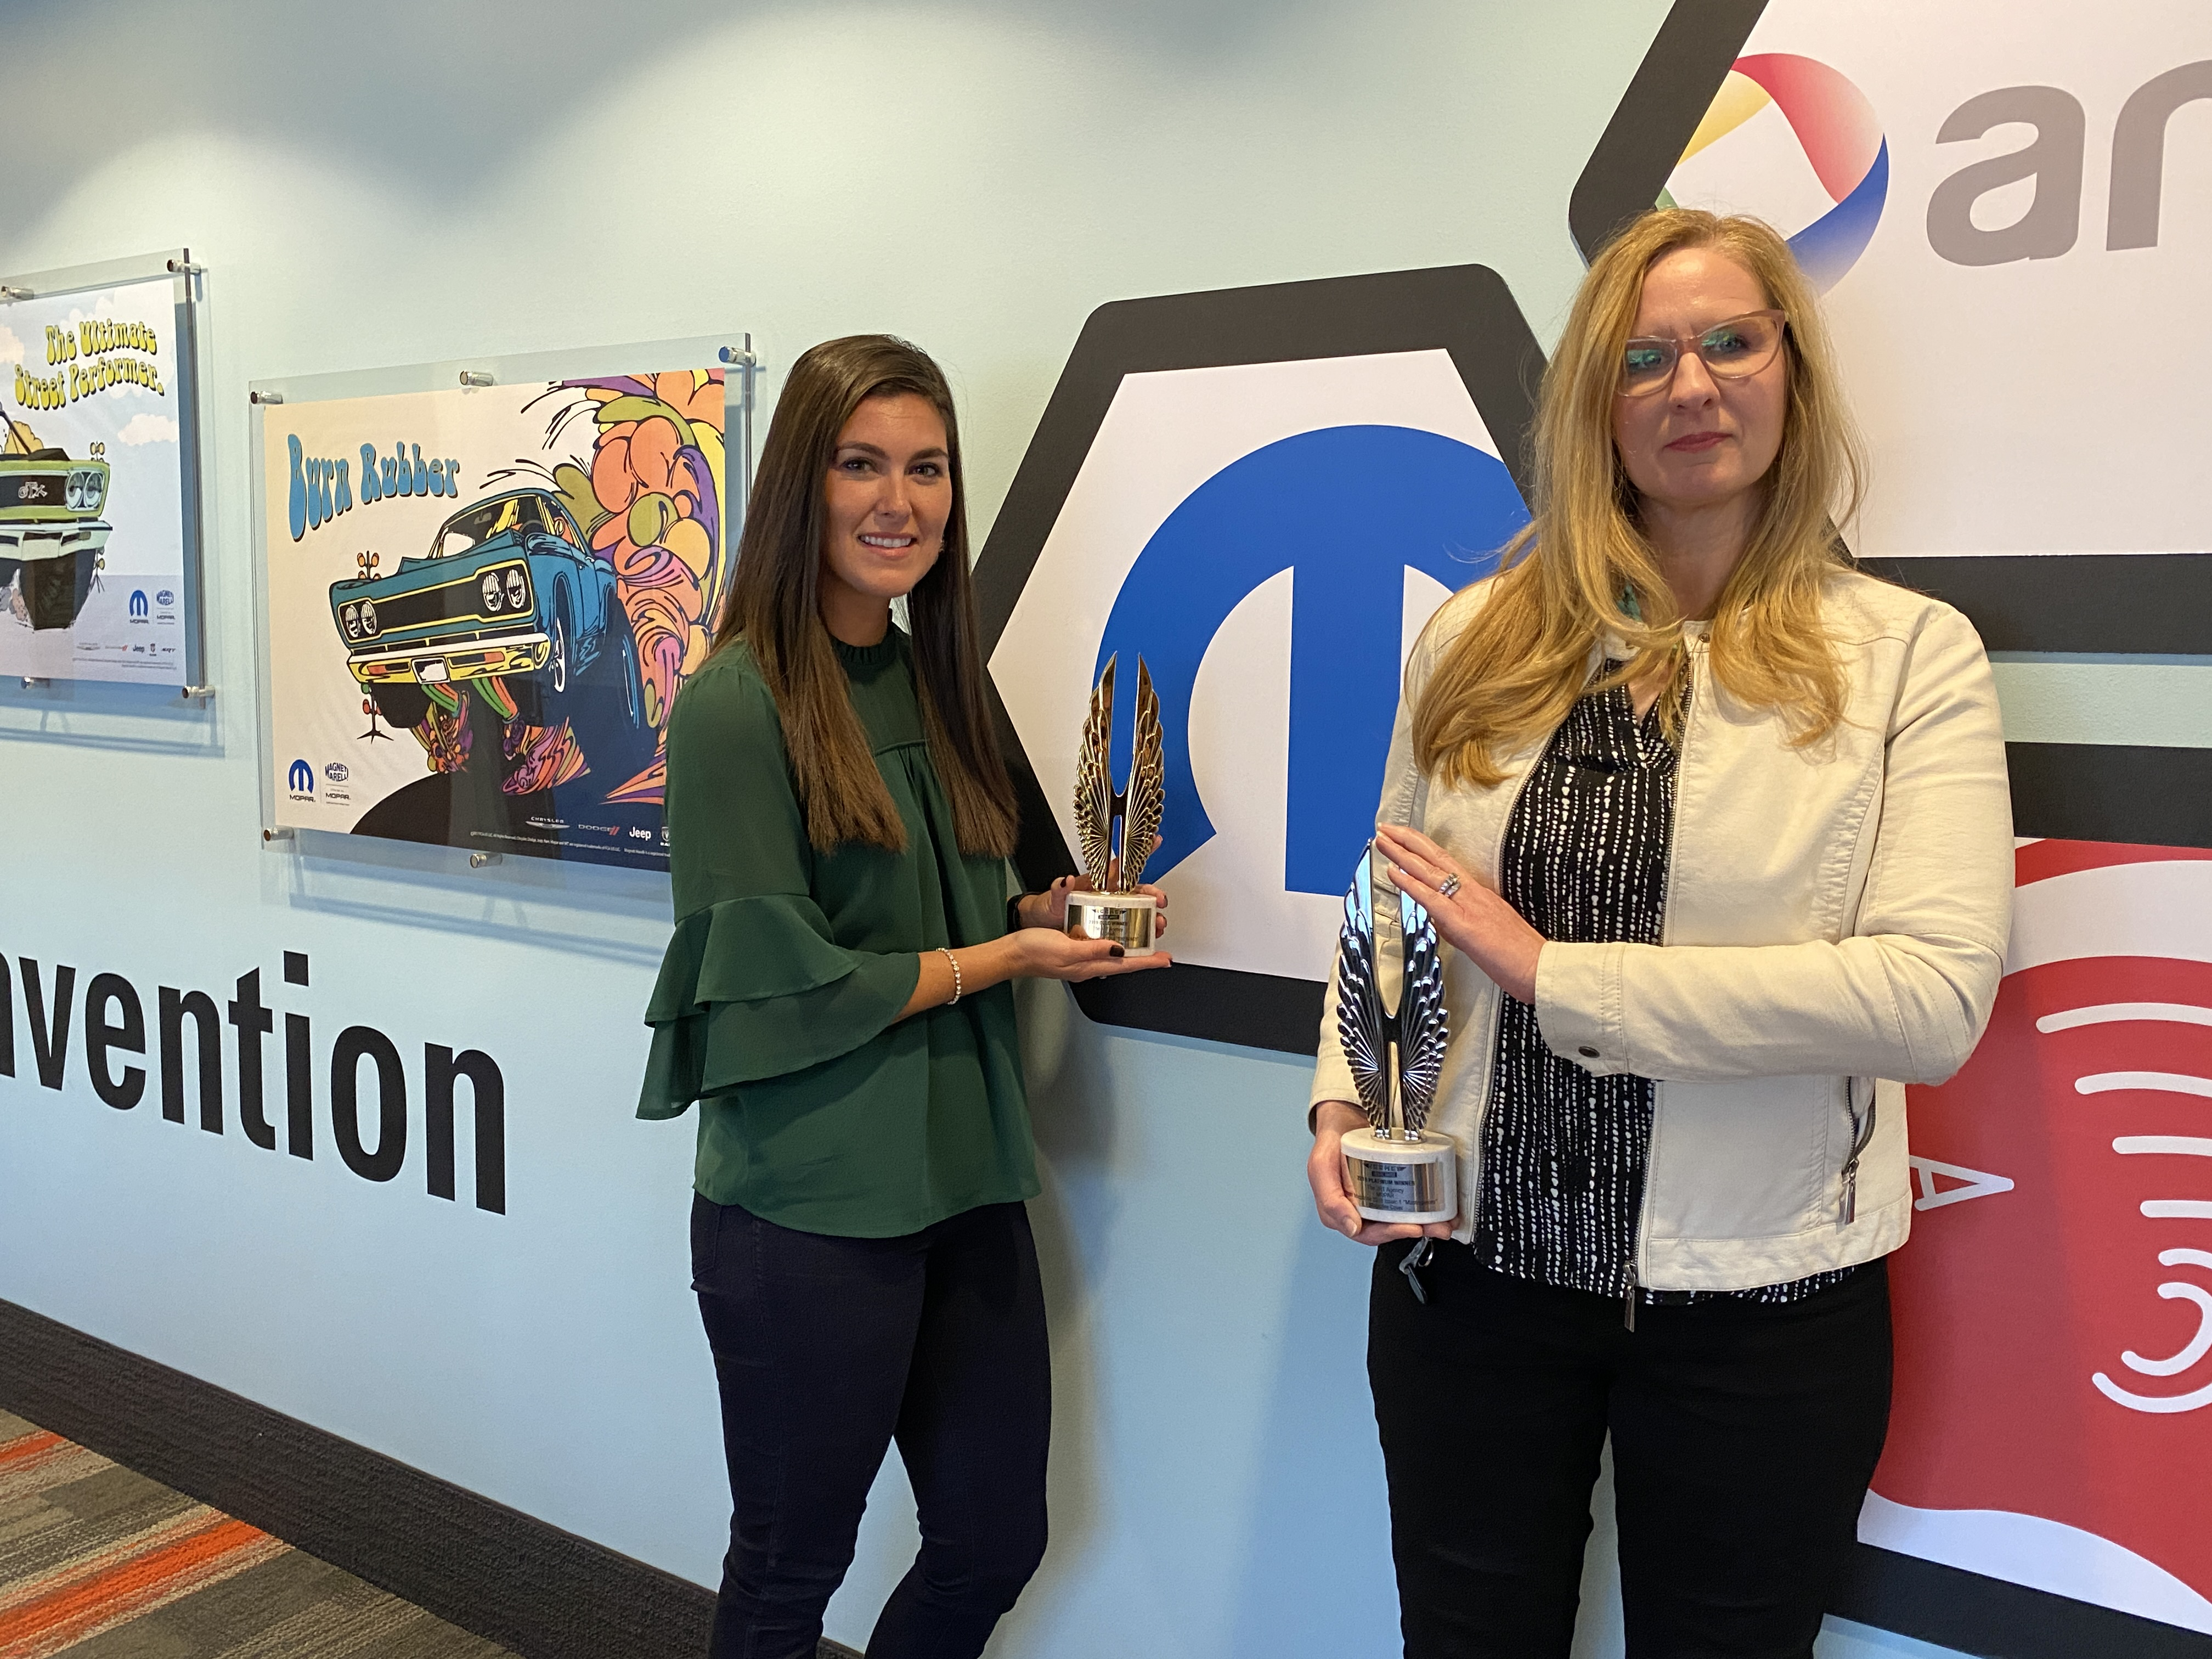 Two women holding awards